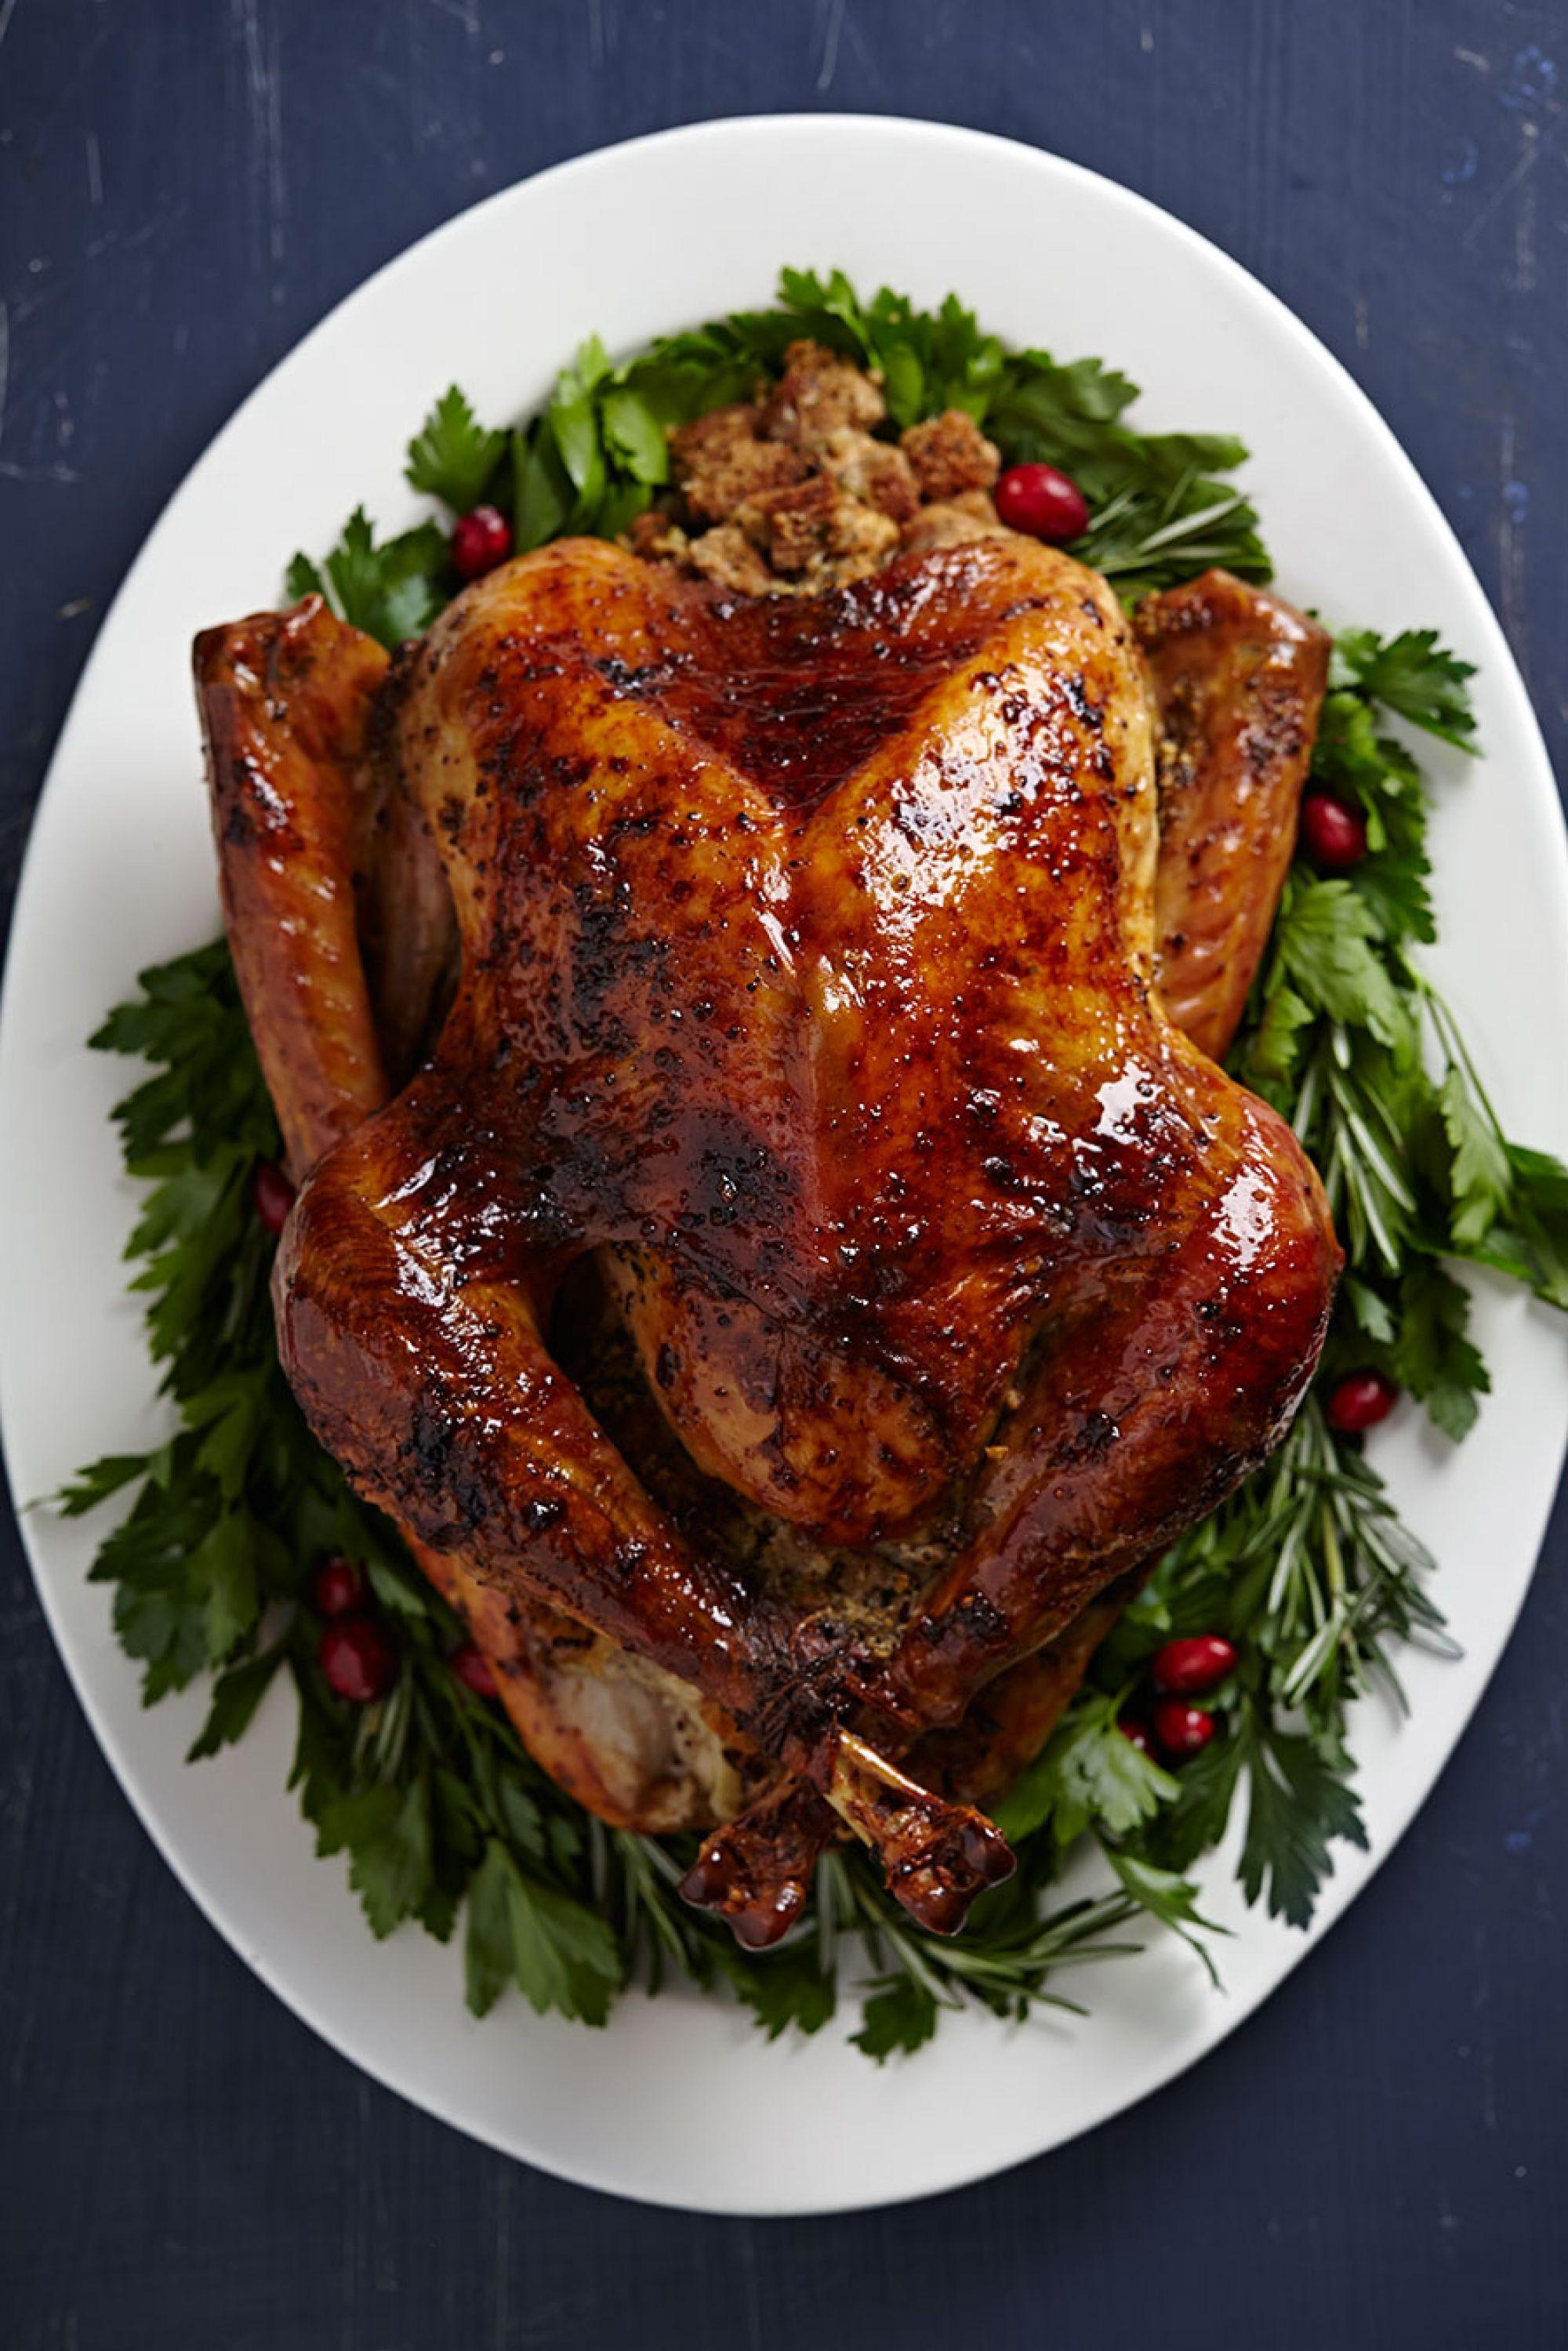 Recipes For Thanksgiving Turkey  Planning a Thanksgiving Menu 25 Amazing Recipes